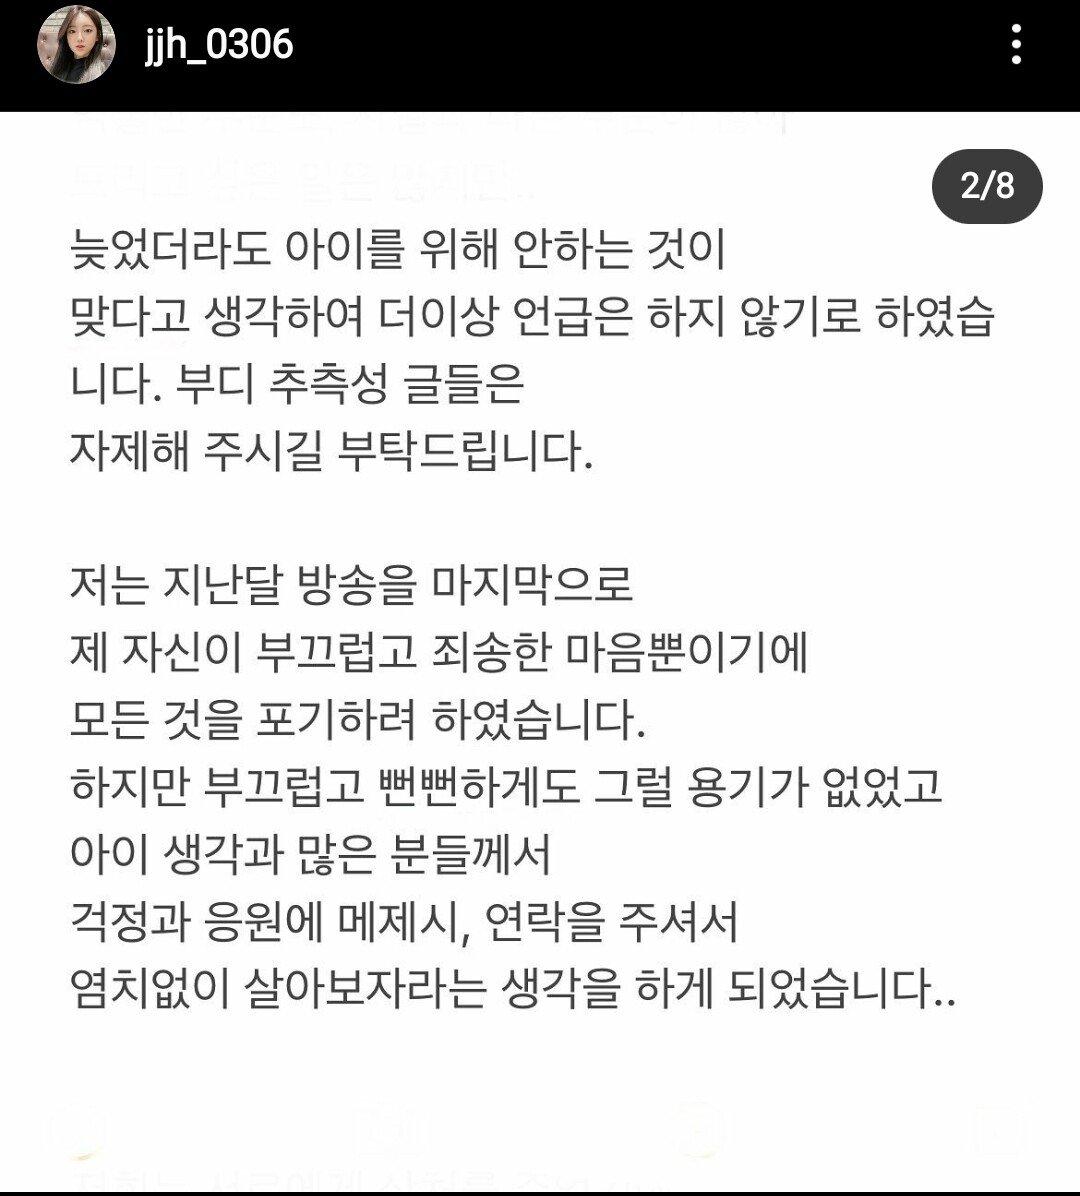 Screenshot_20210616-013114_Instagram.jpg [스압] BJ외질혜 인스타 피드사진 업로드....jpg